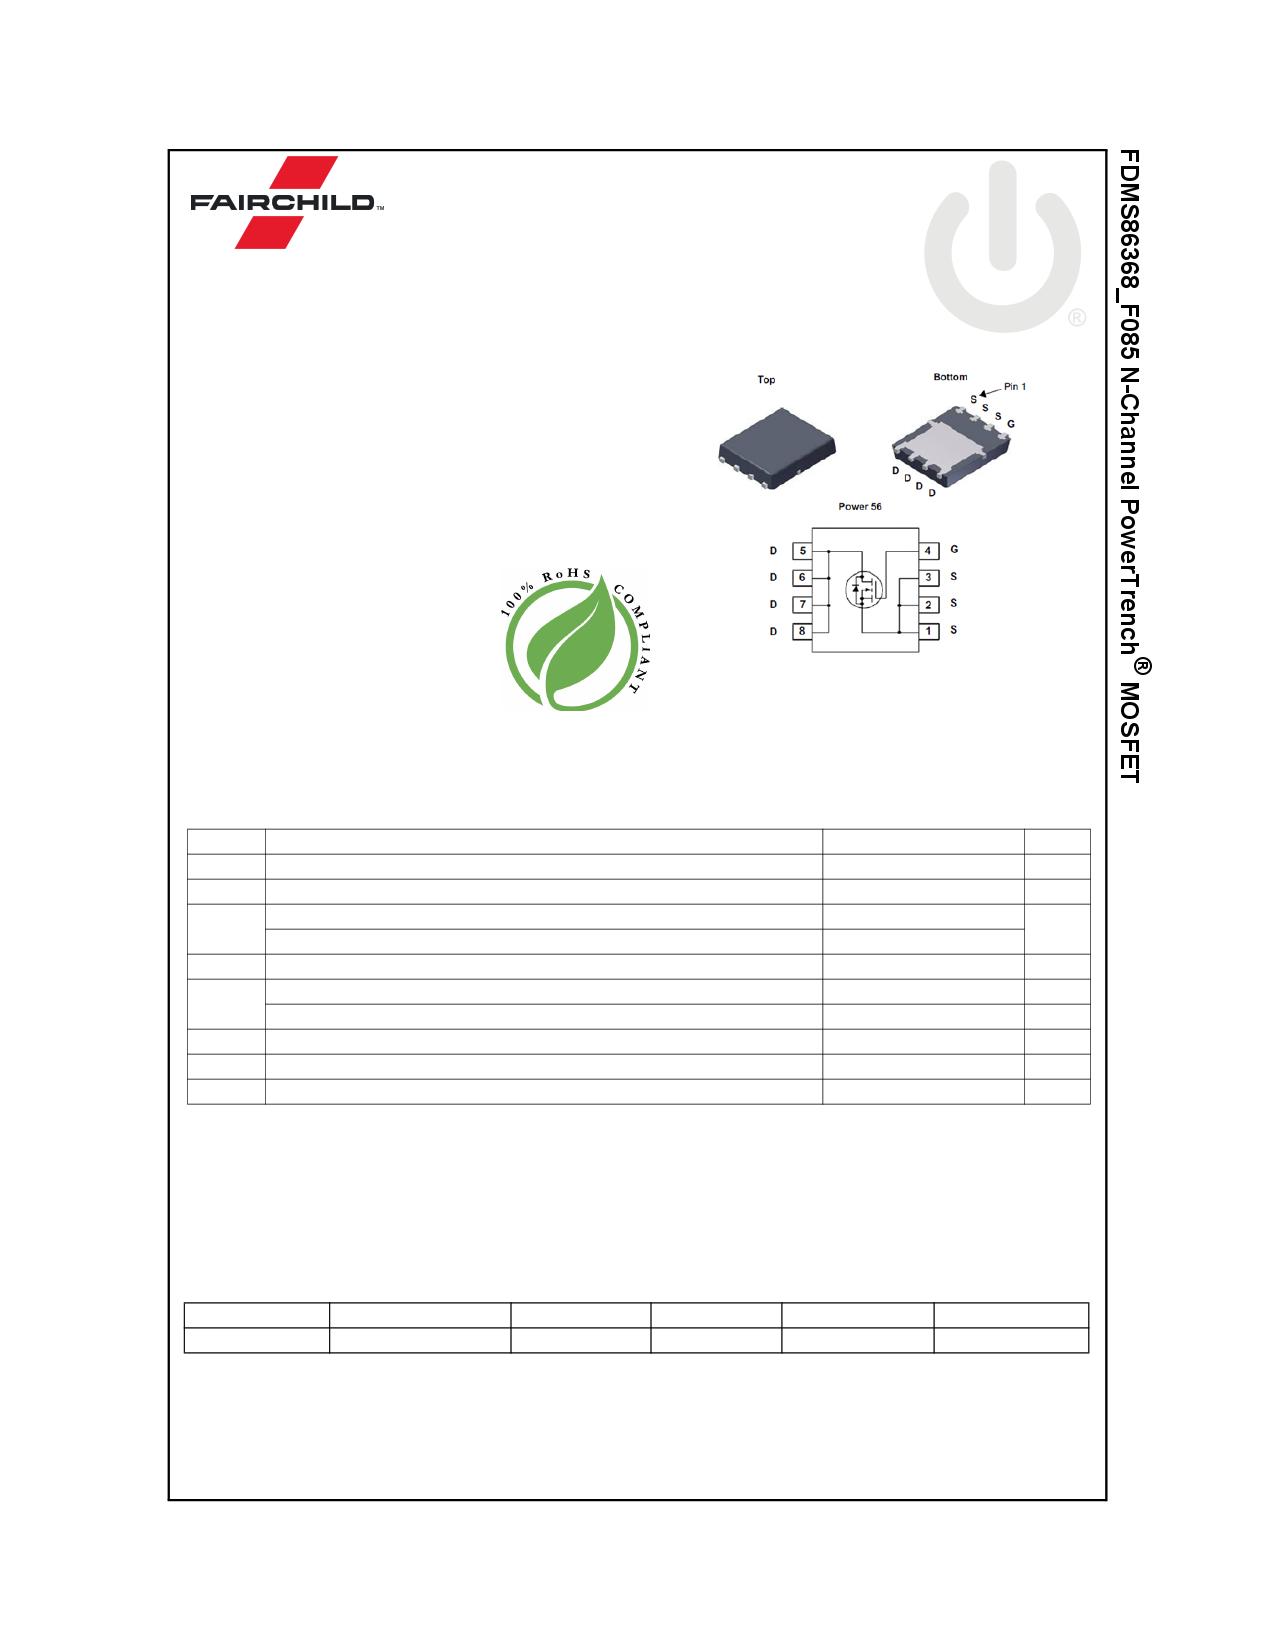 FDMS86368_F085 Datasheet, FDMS86368_F085 PDF,ピン配置, 機能